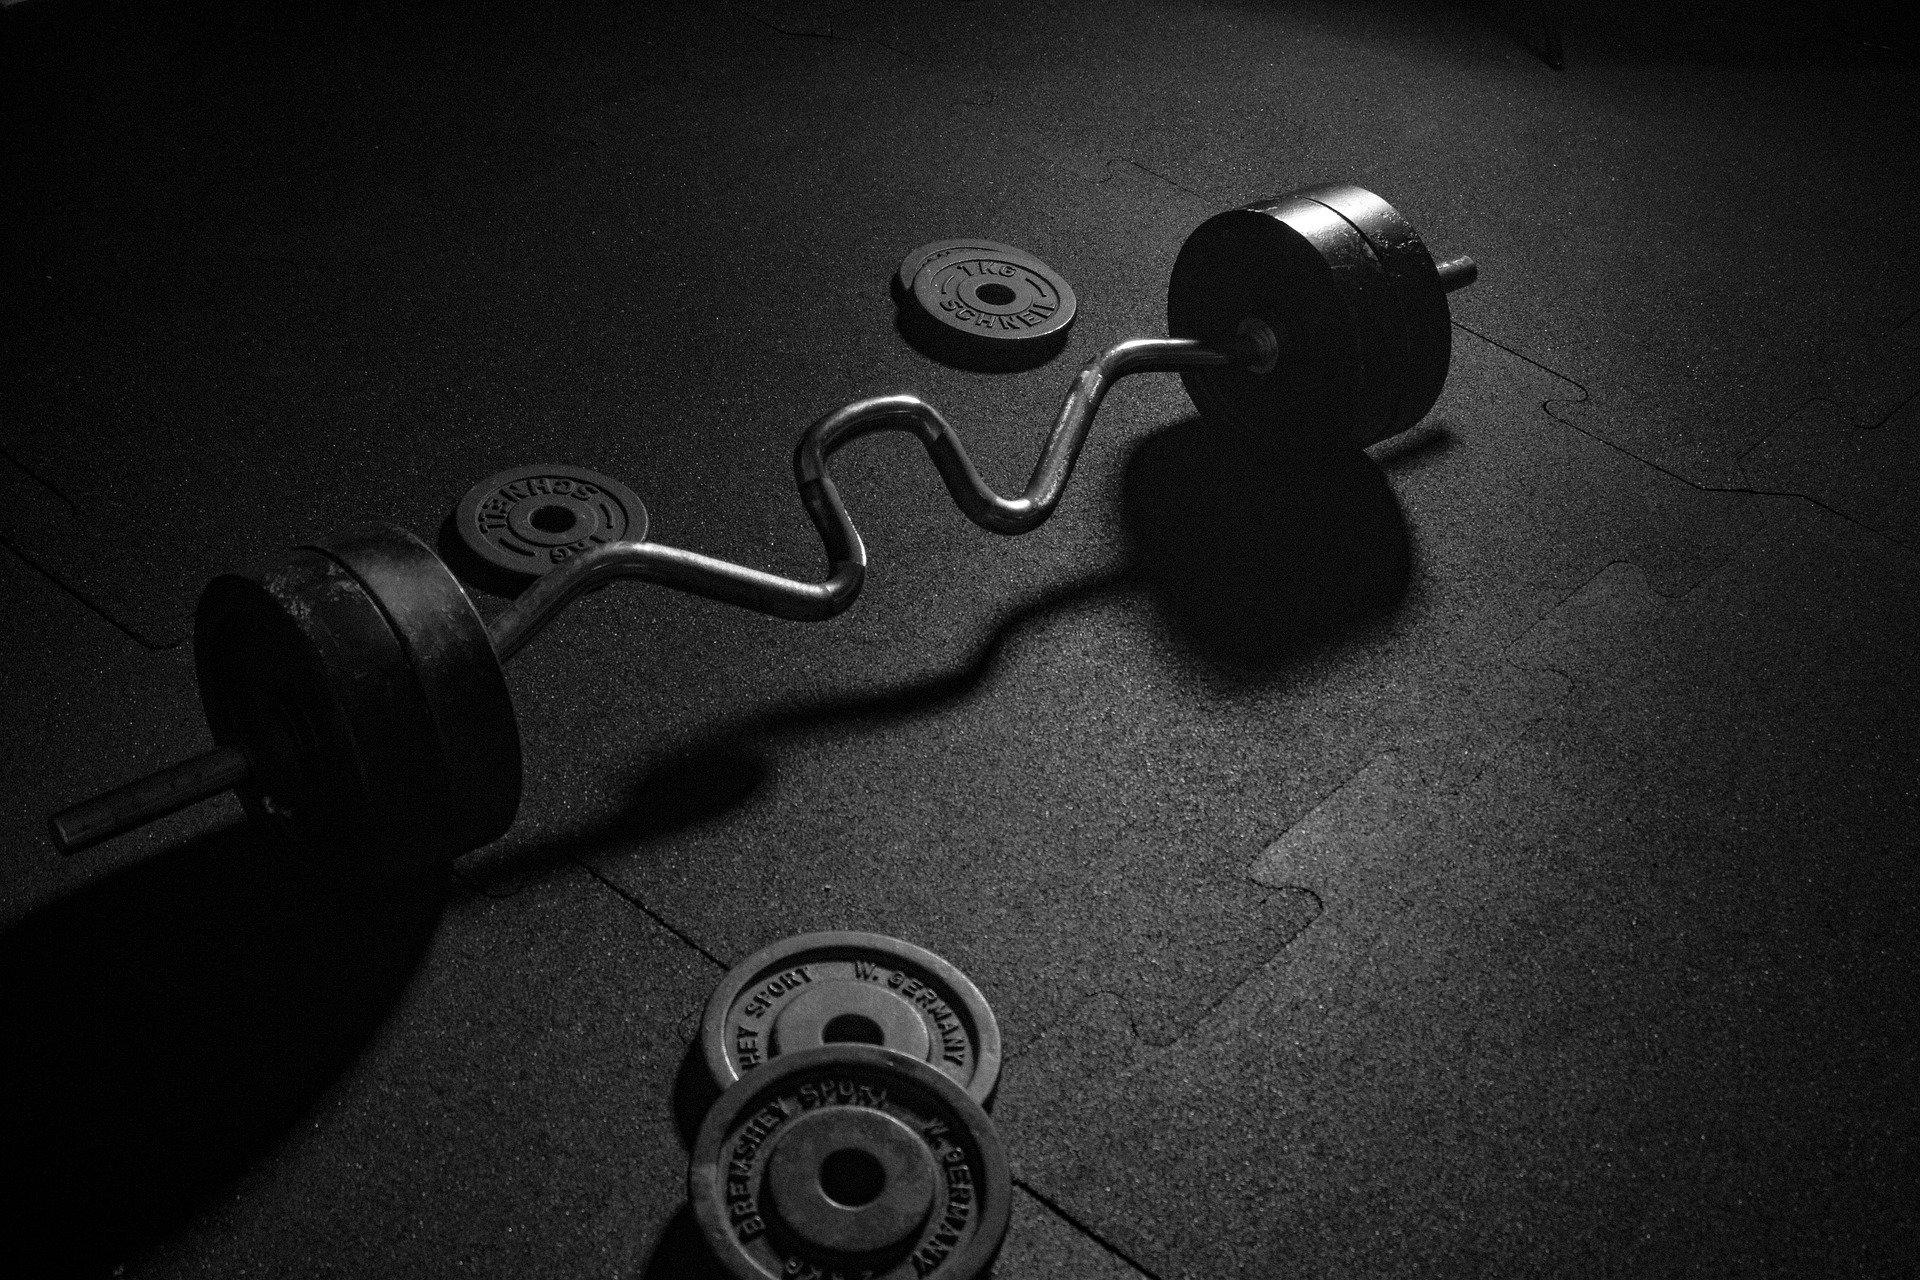 Unterlegmatte Fitnessgerät